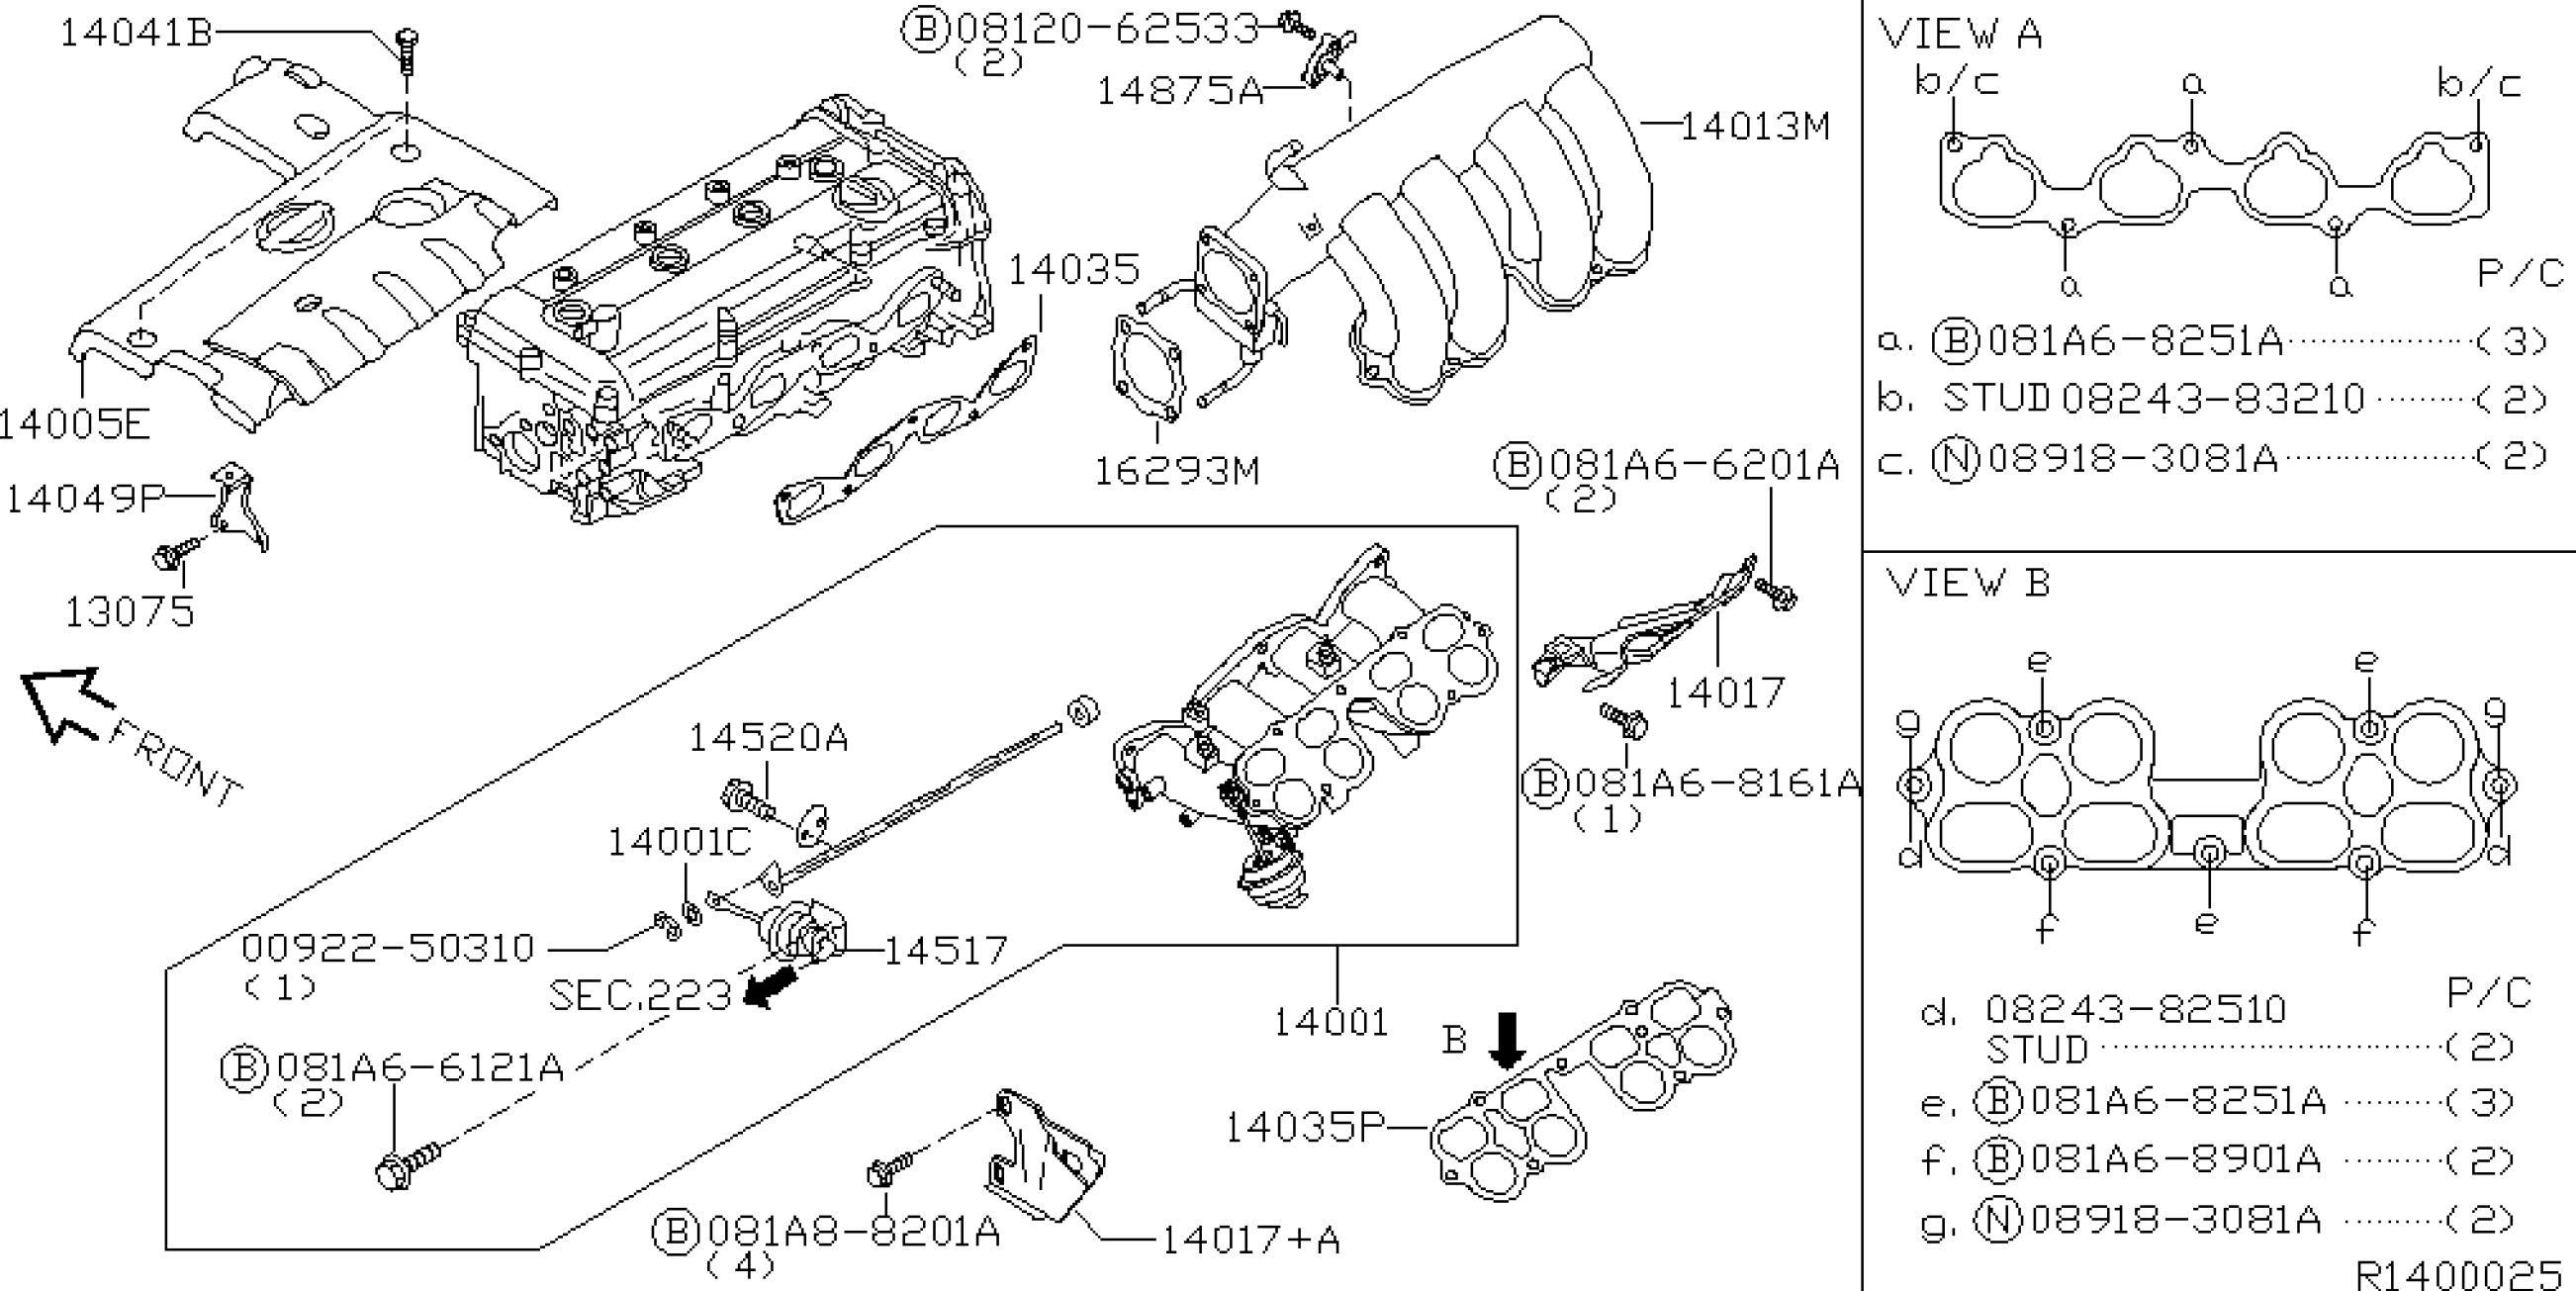 1998 kia sephia fuse box diagram 97 altima fuse diagram wiring schematic diagram www diddlhausen  97 altima fuse diagram wiring